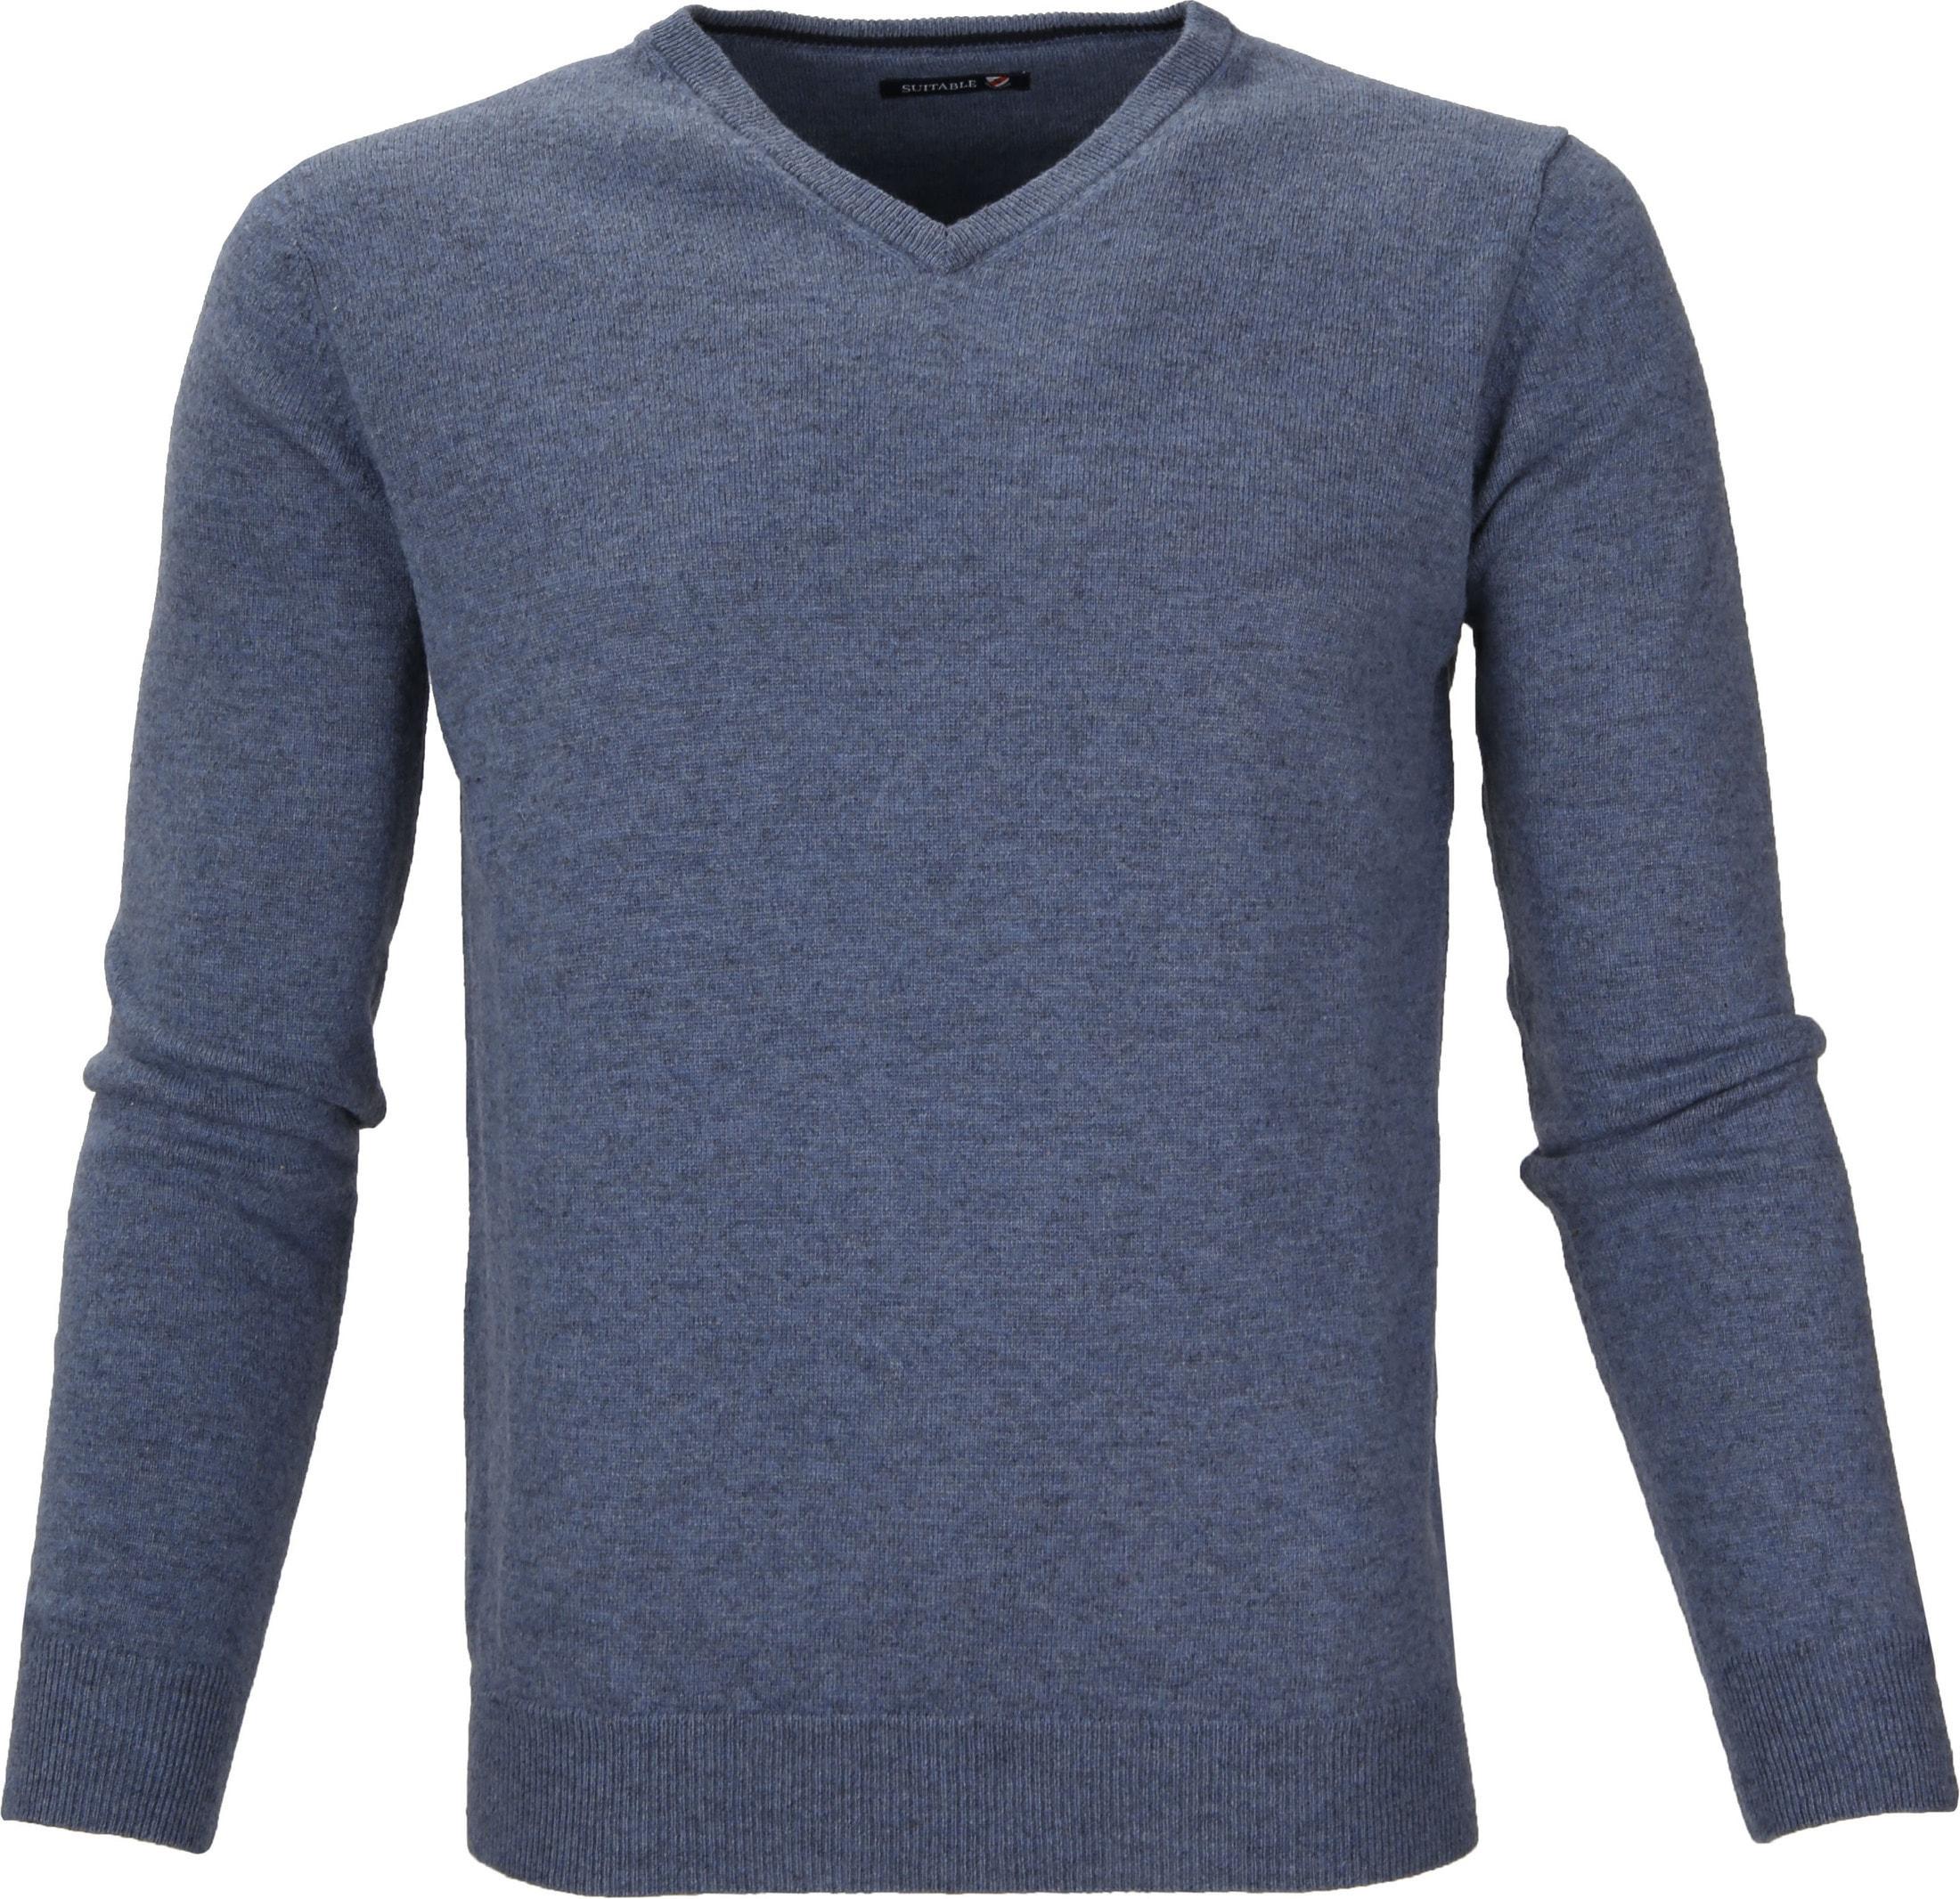 Suitable Pullover Lamswol V-Hals Lichtblauw foto 0